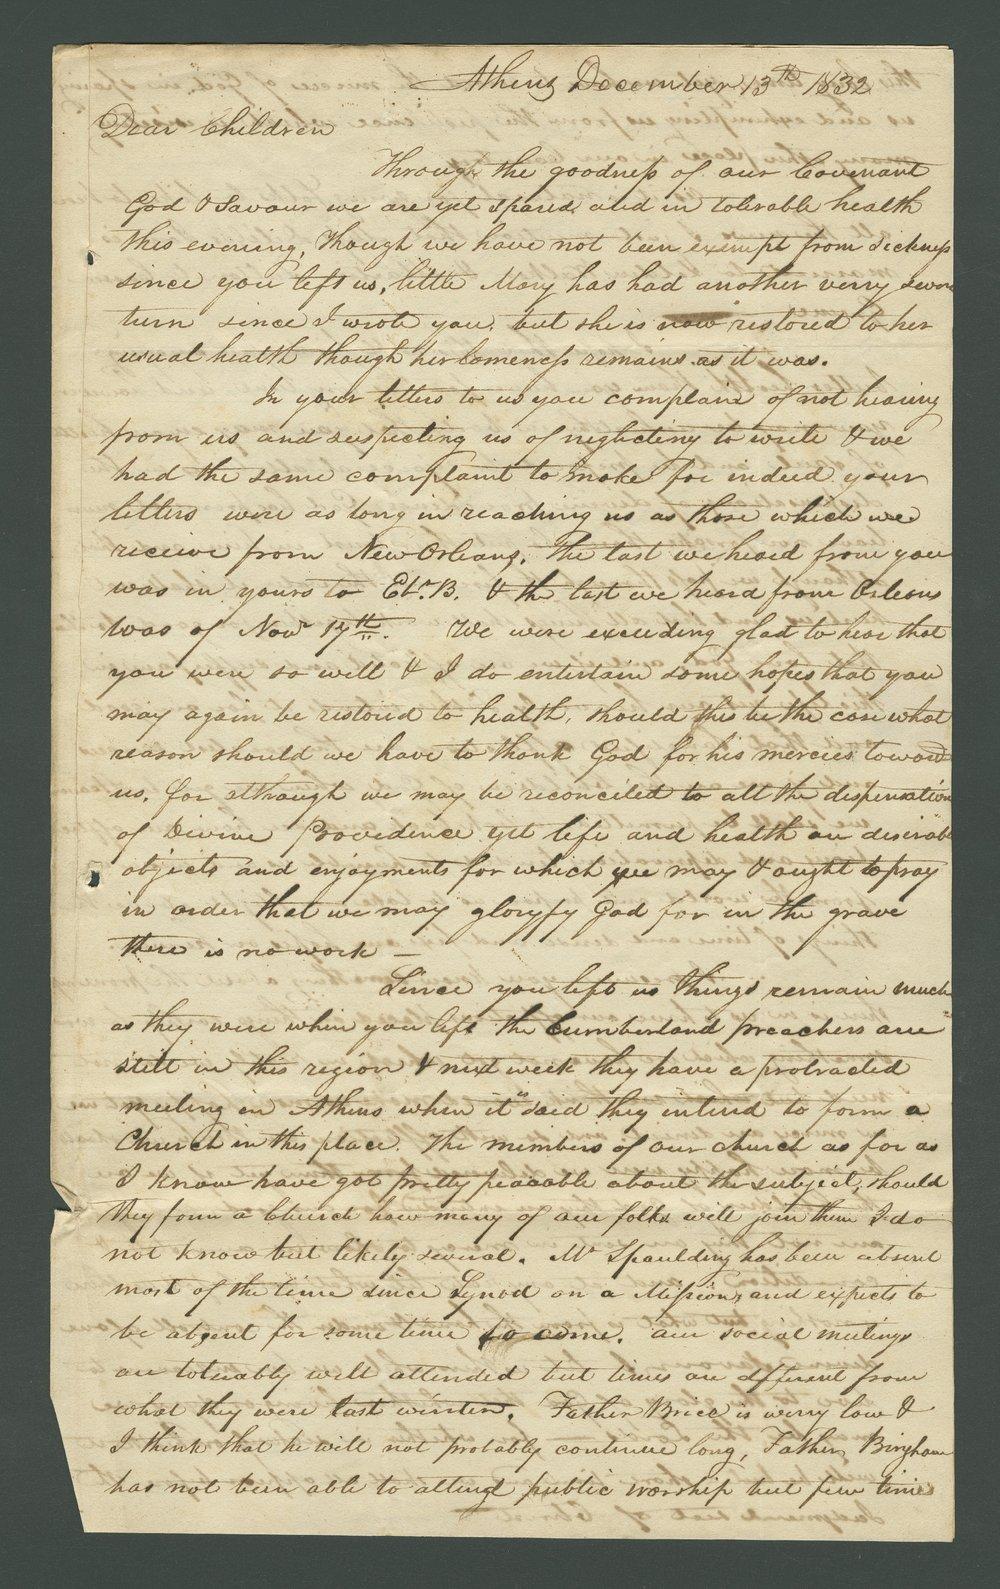 Joseph B. Miles to Lewis Allen Alderson - 4